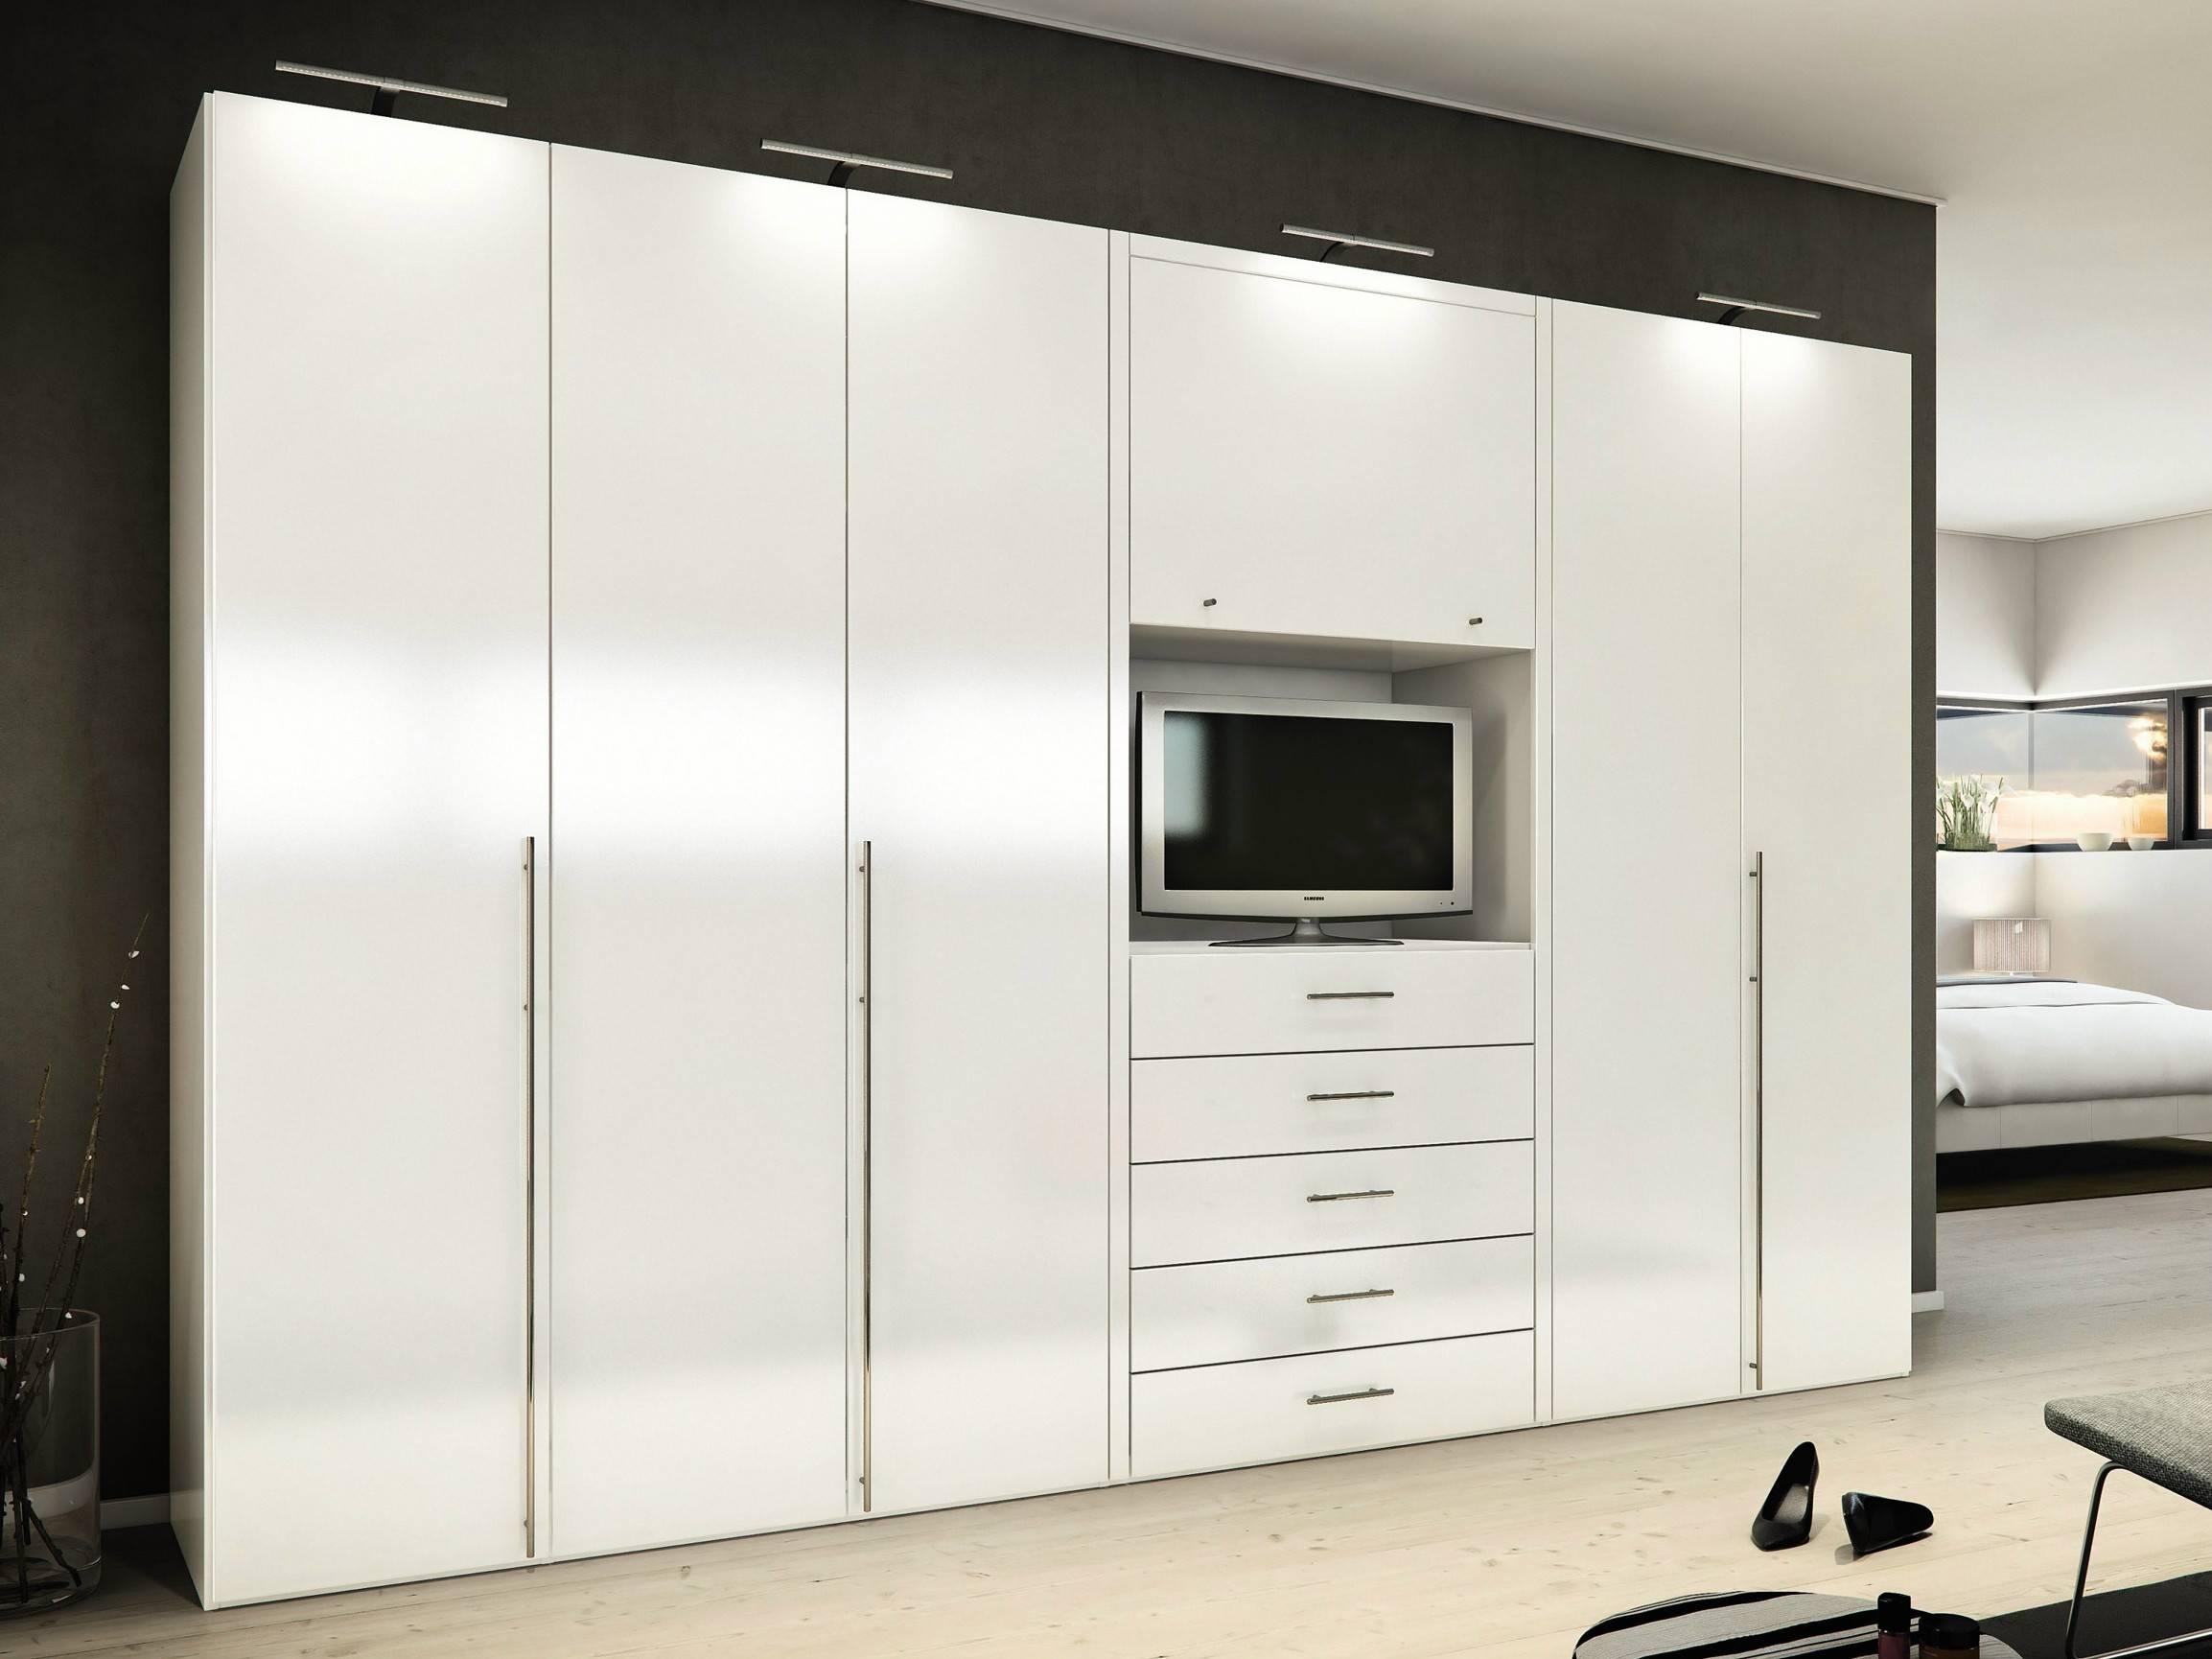 Custom Dark Brown Lacquer Teak Wood Wardrobe With Glass Door Panel Pertaining To Solid Dark Wood Wardrobes (View 8 of 30)